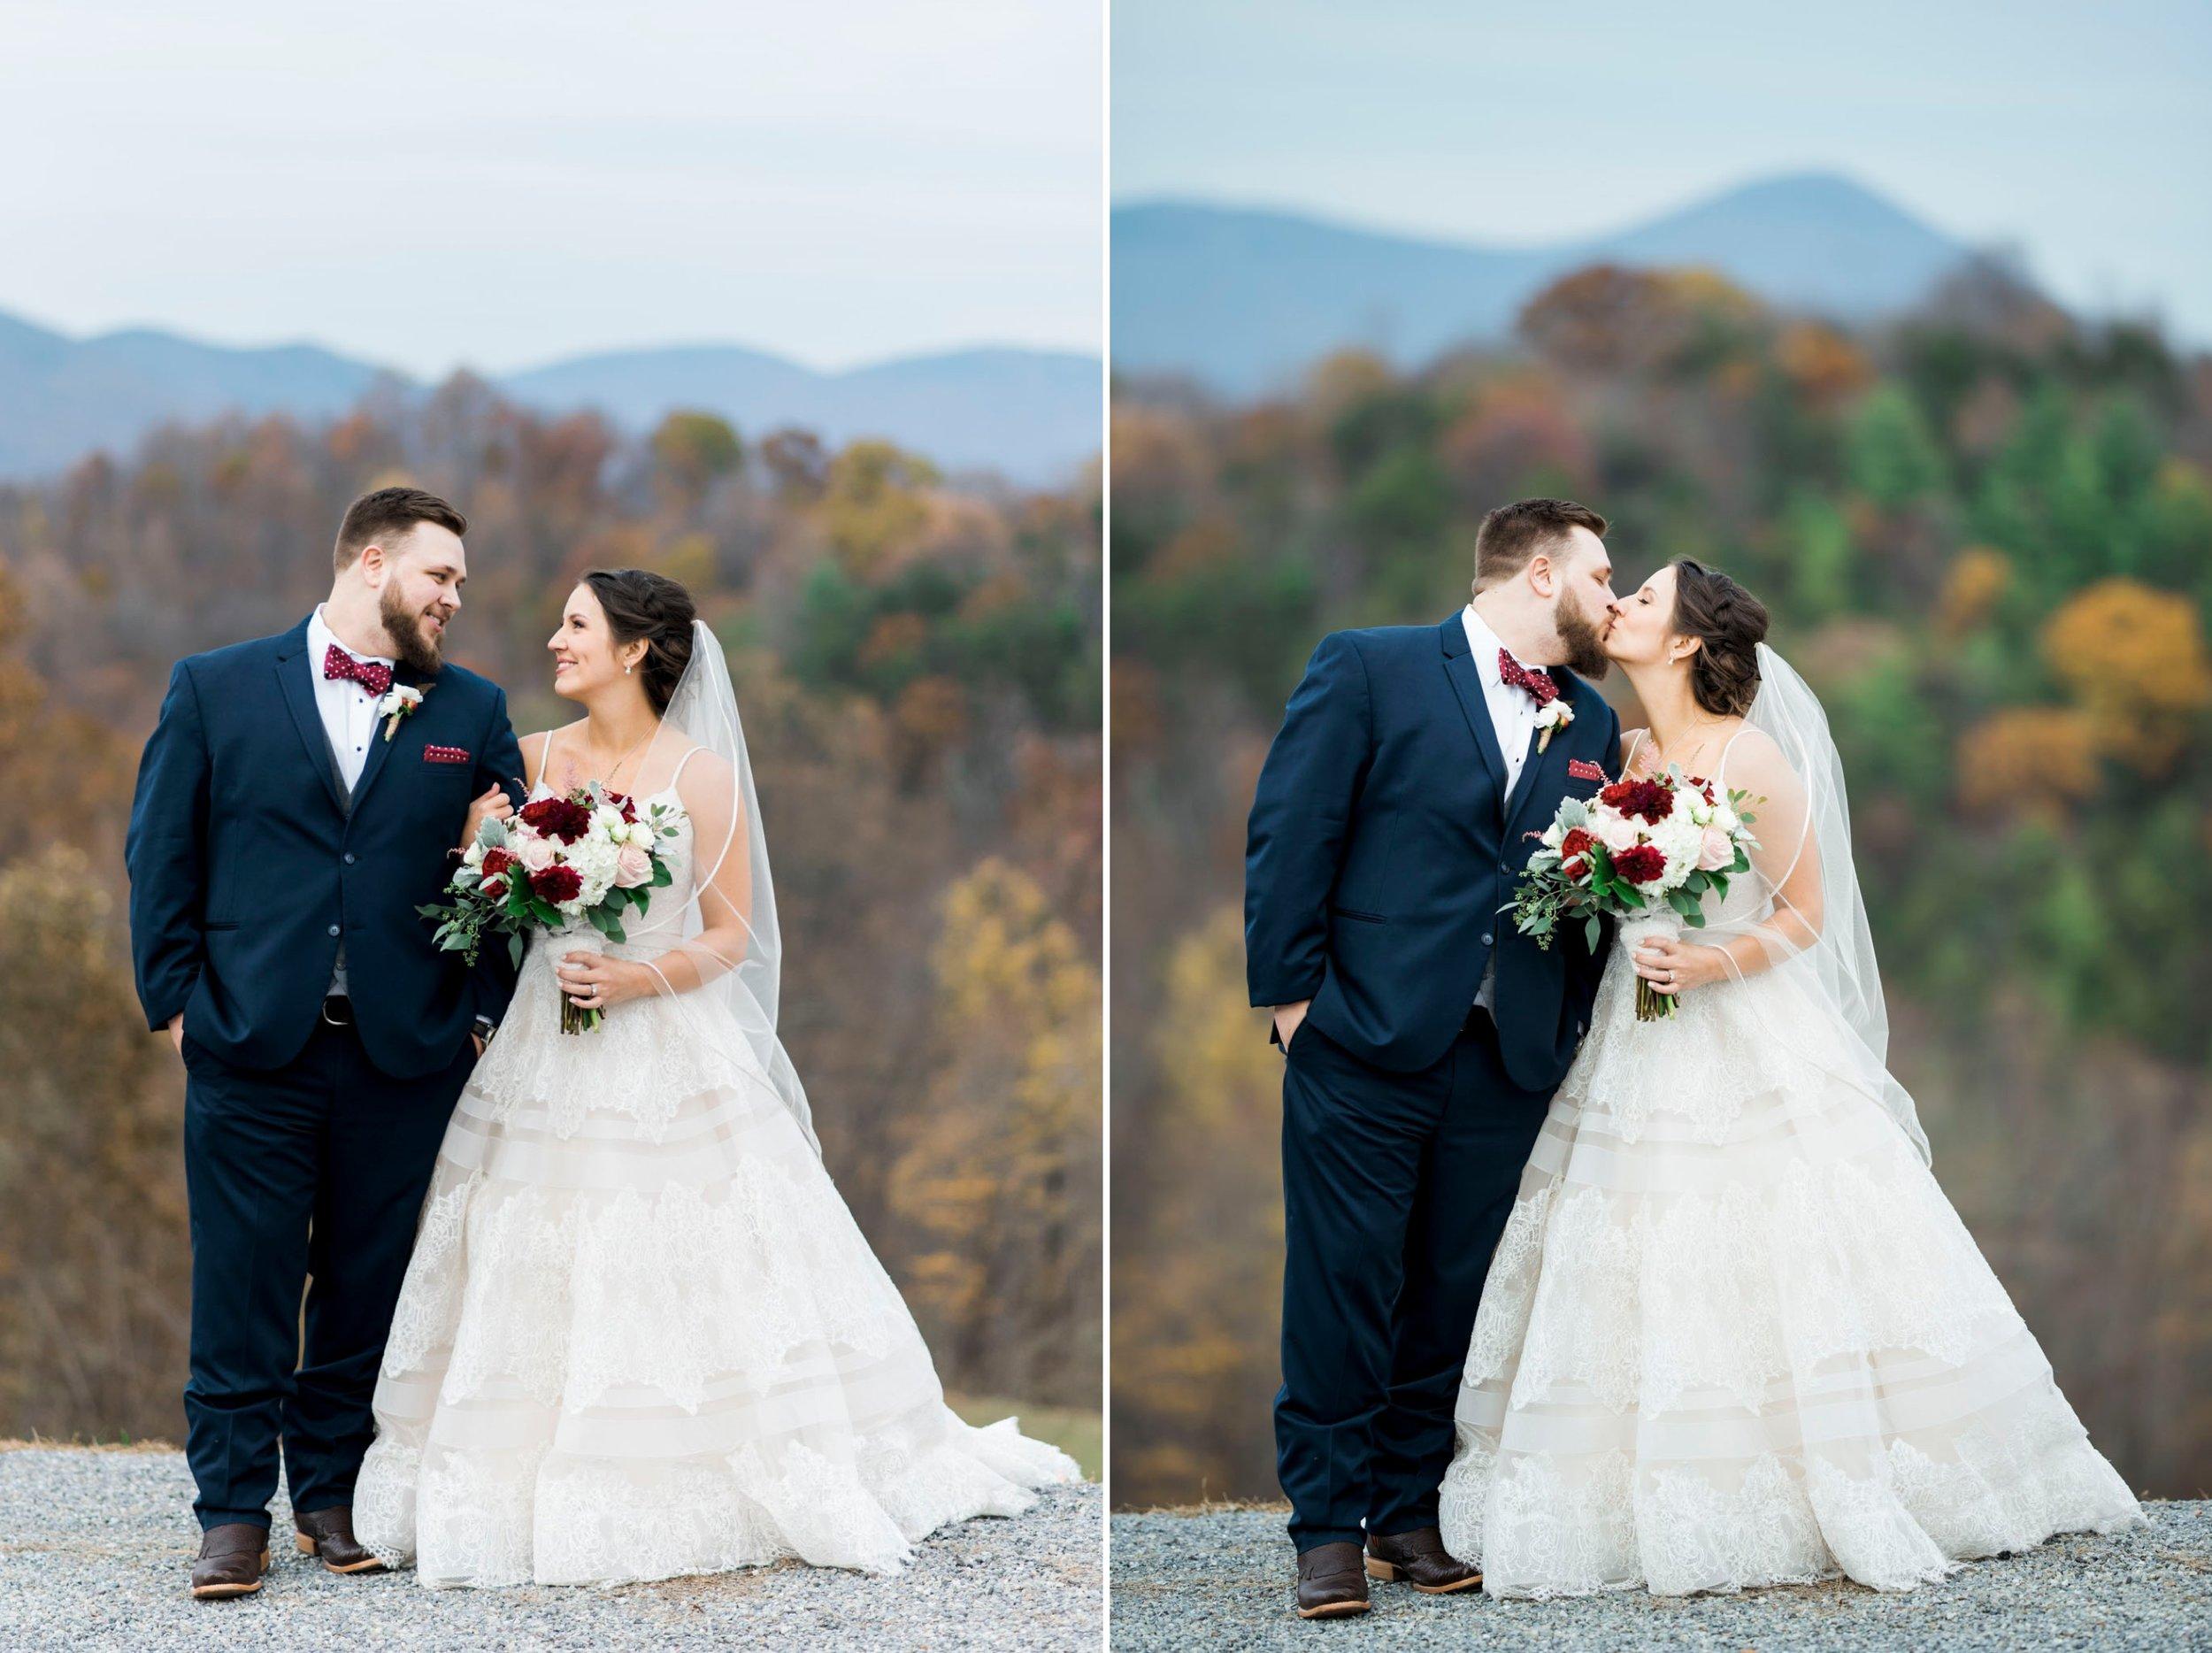 IrvineEstate_LexingtonVA_Wedding_FallWedding_VirginiaWeddingPhotographer 79.jpg